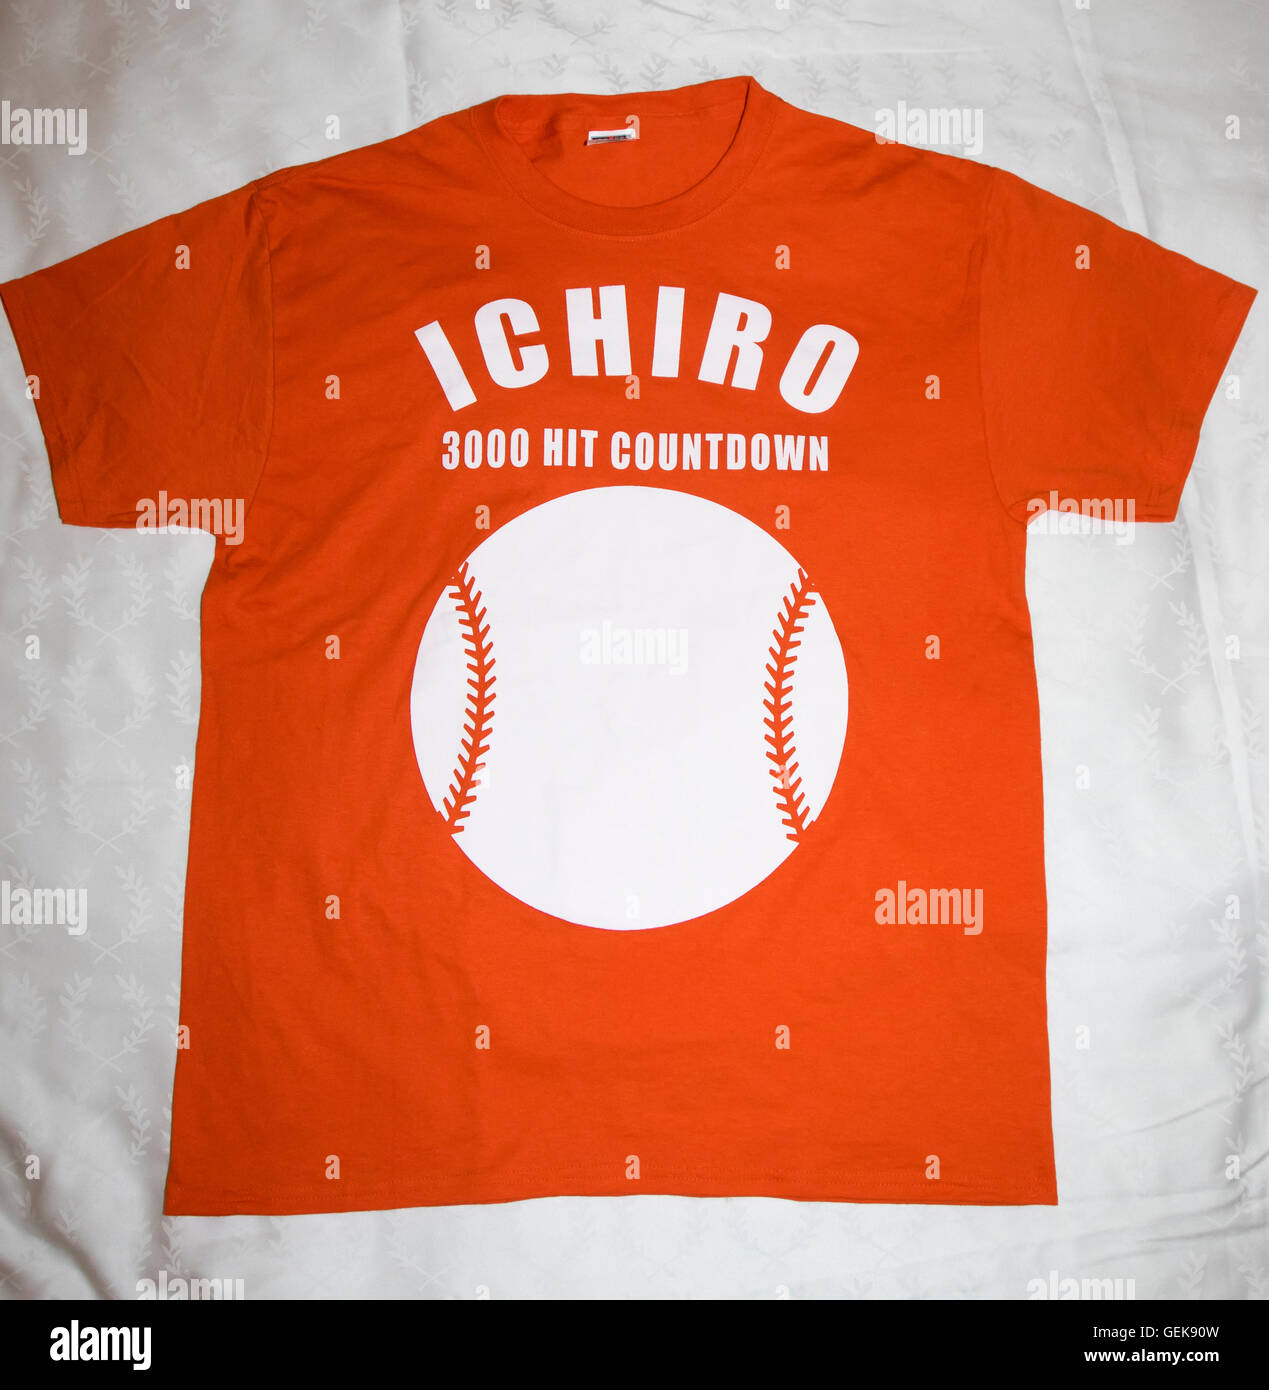 Miami, Florida, USA. 25th July, 2016. Ichirio T-shirt MLB